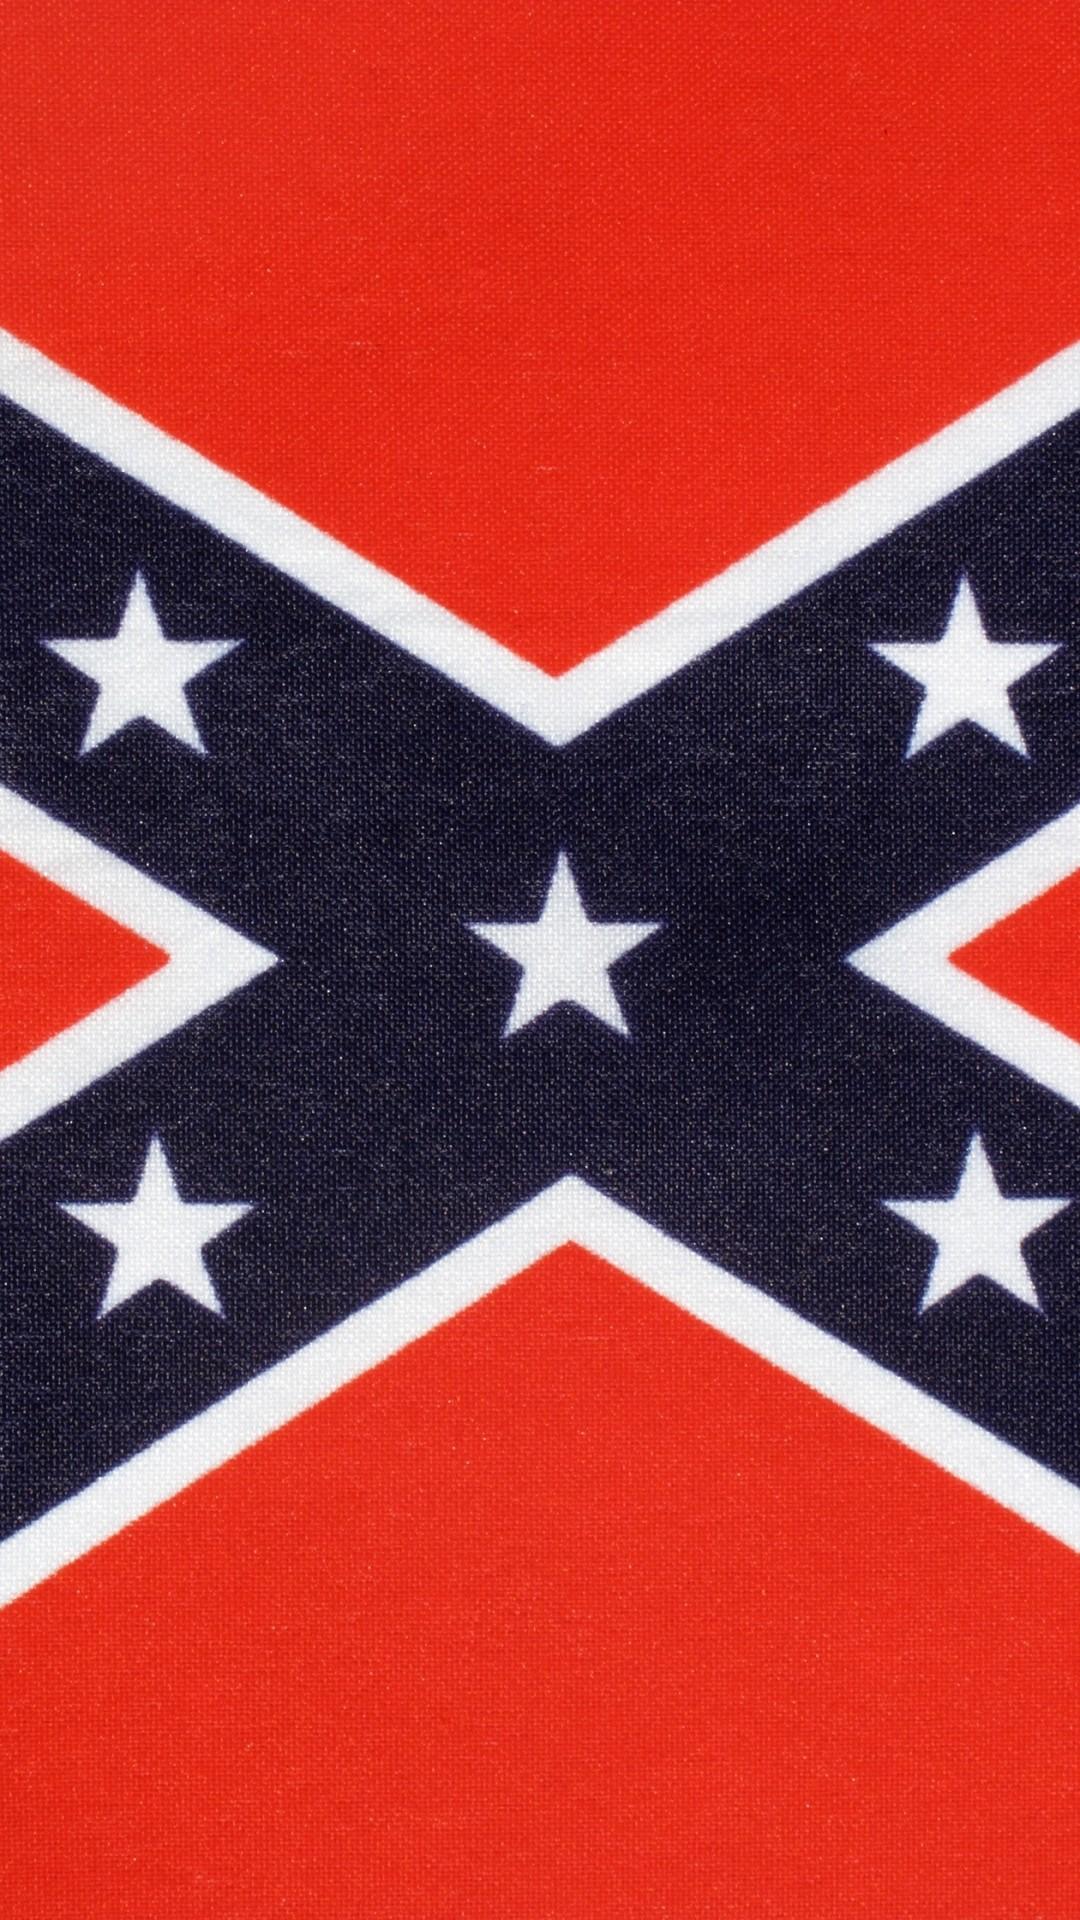 Bing Animated Wallpaper Cool Rebel Flag Wallpaper 59 Images